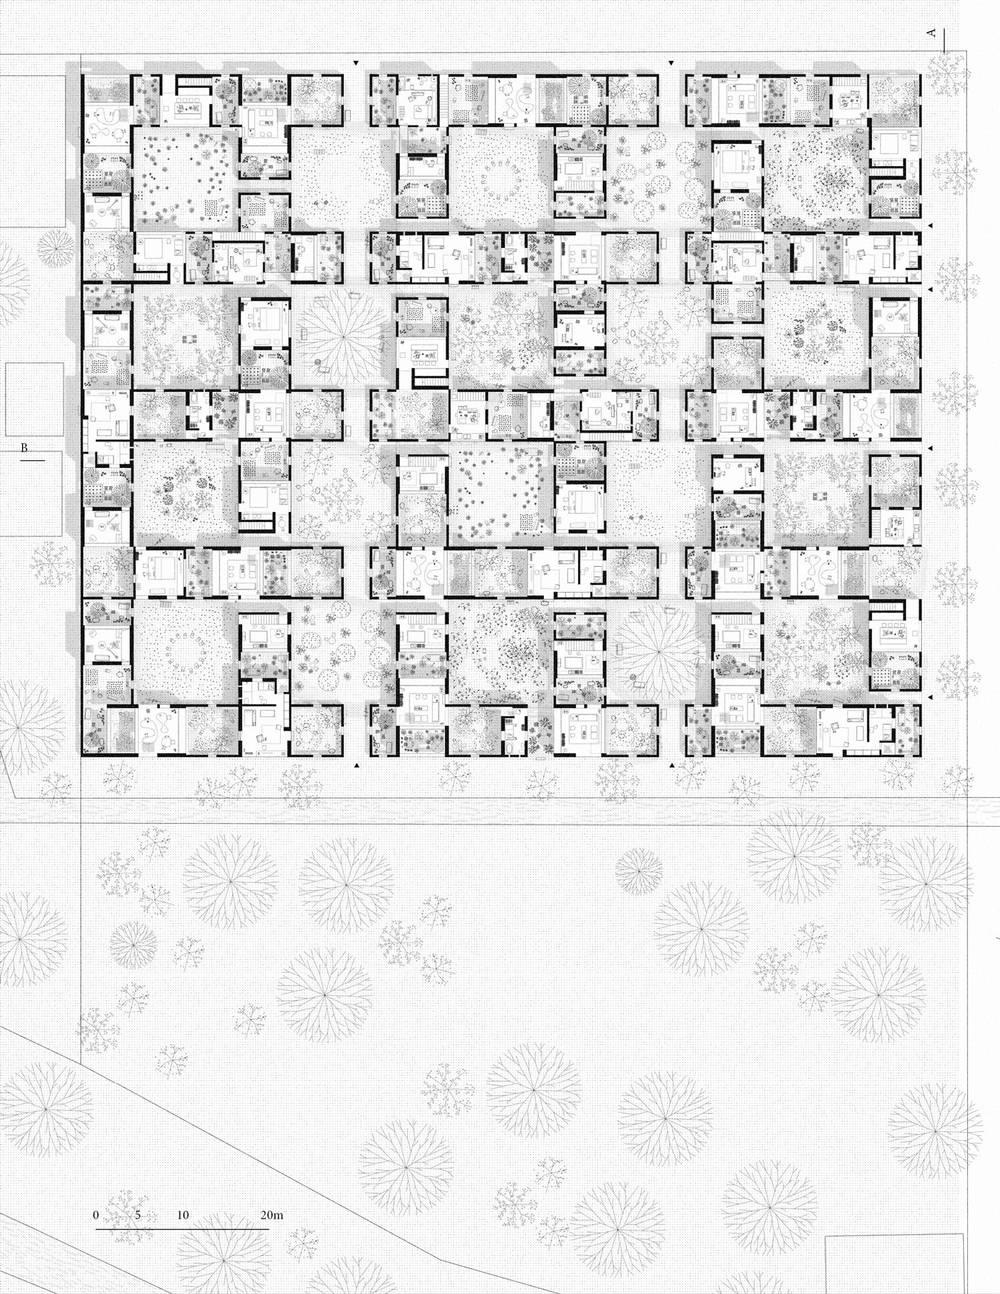 santo-santiago-houses-plan.jpg